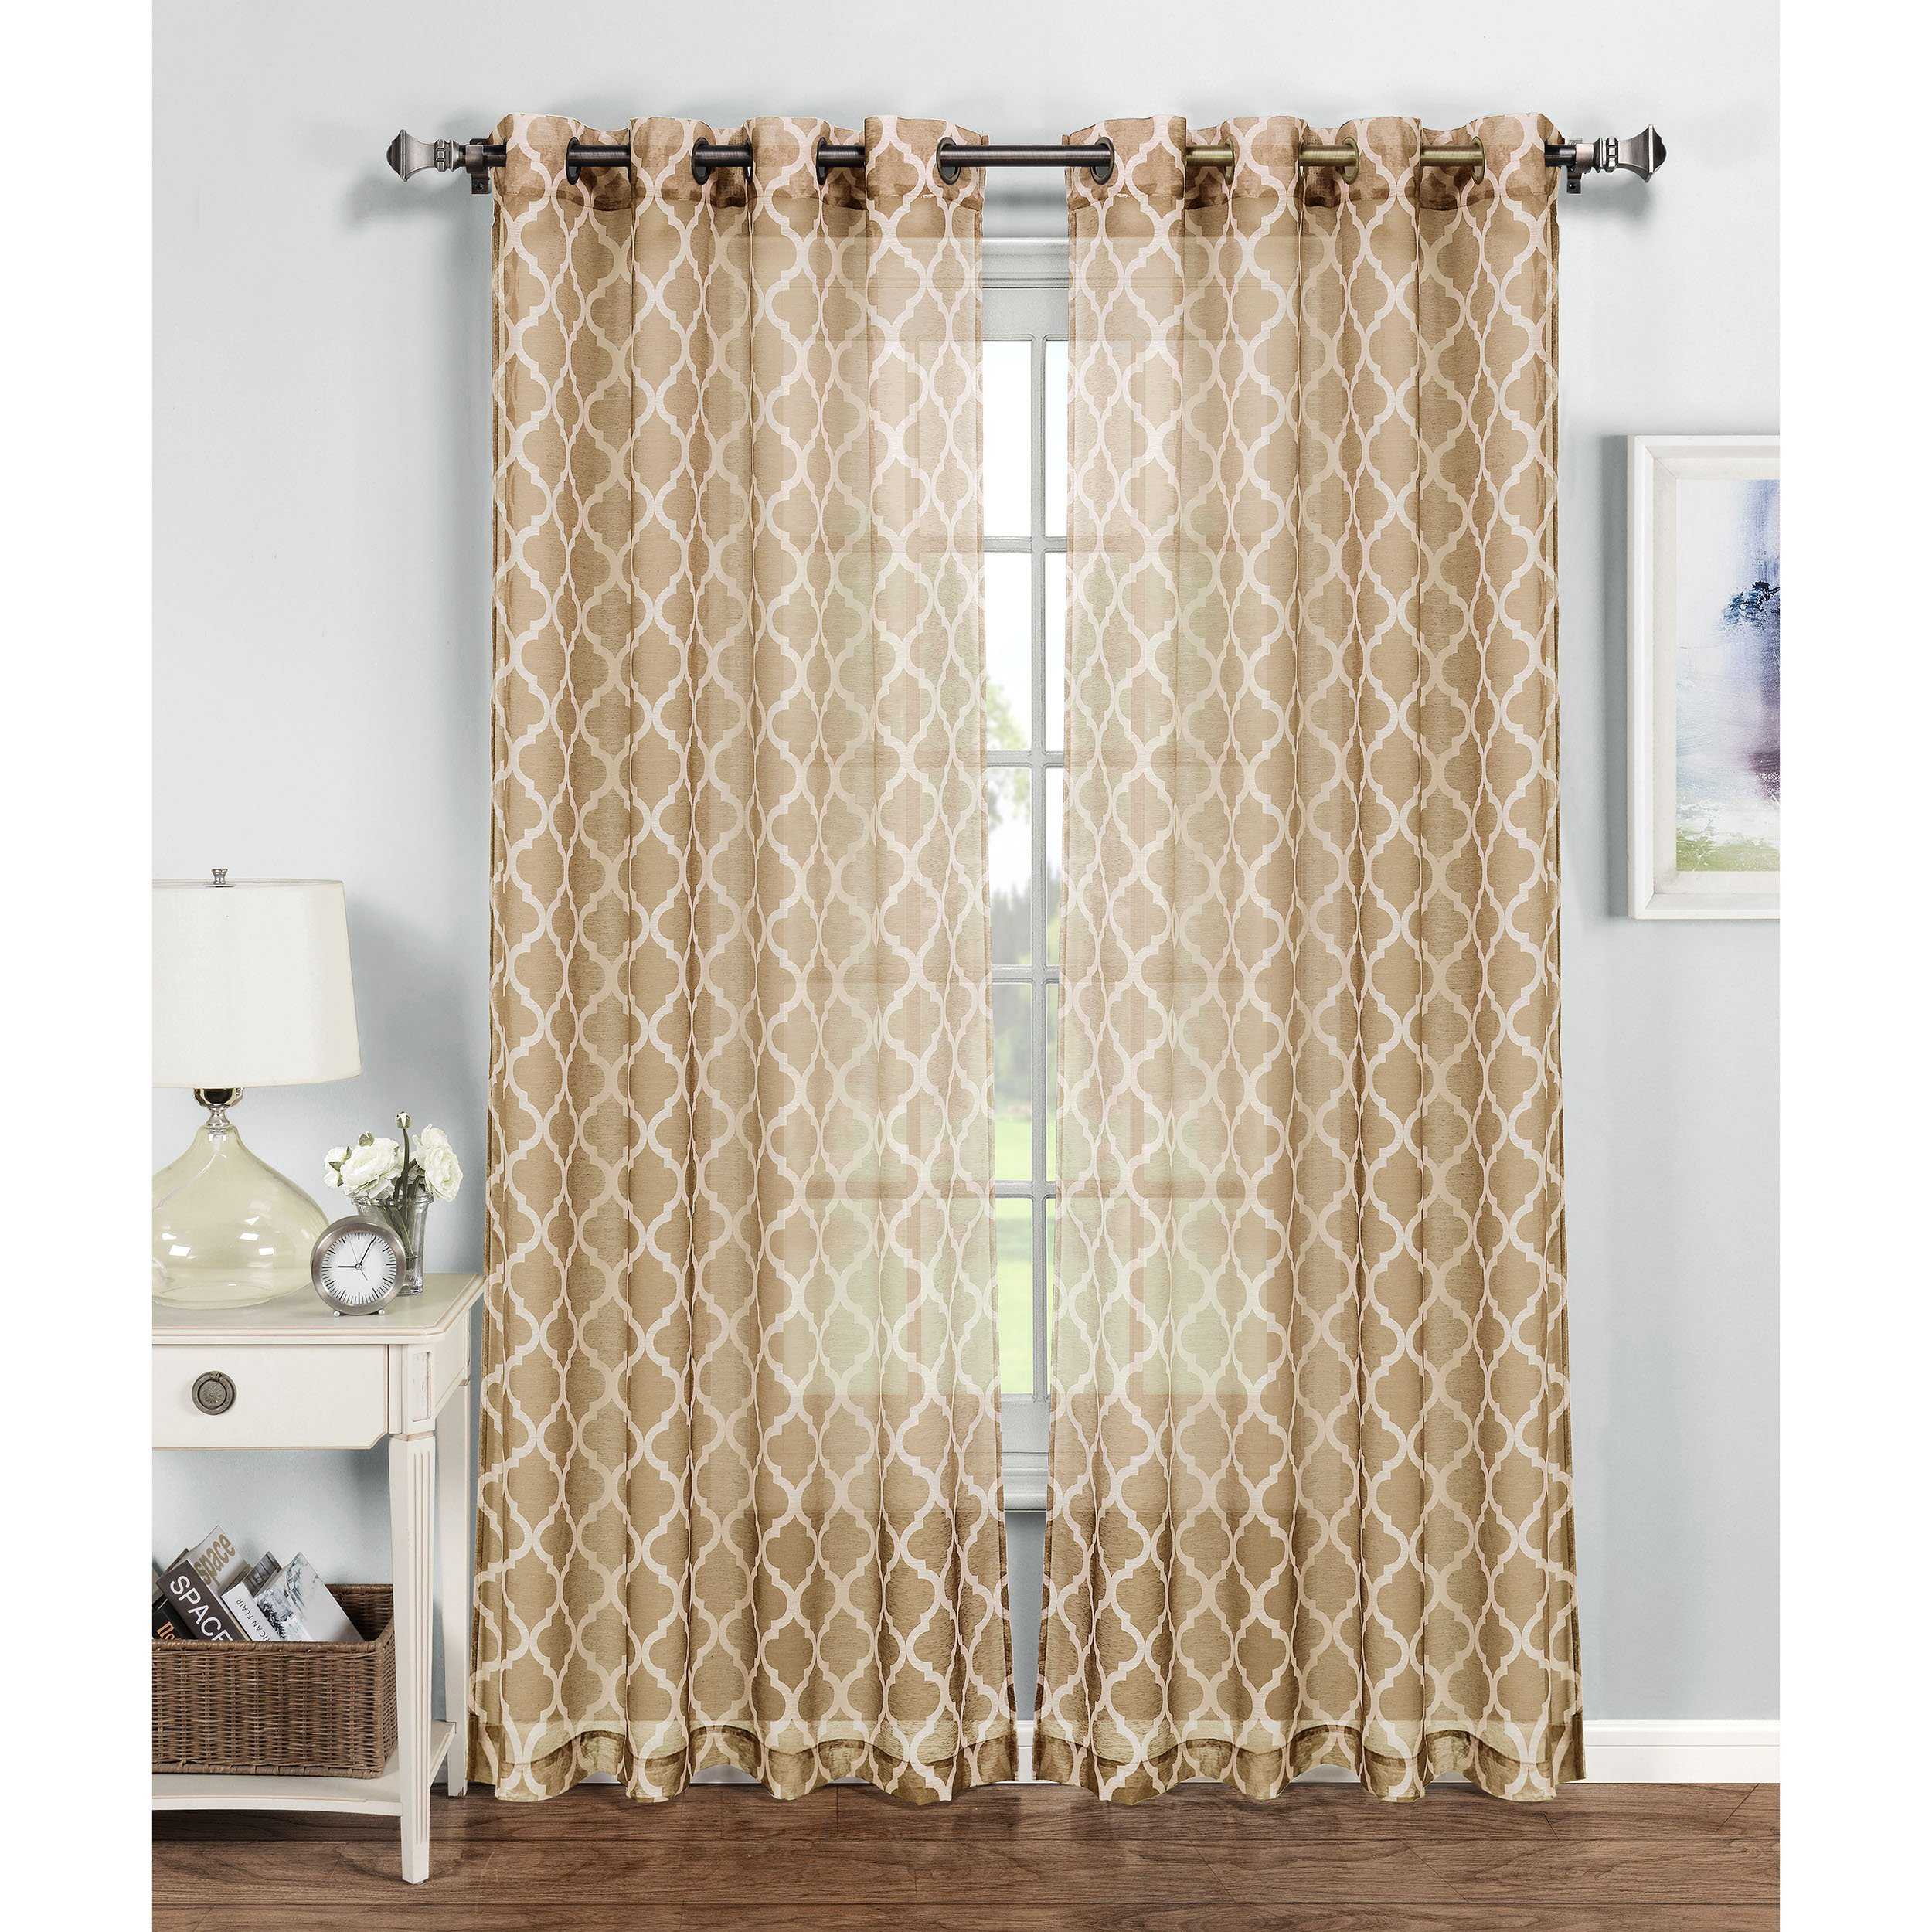 Window Elements Quatrefoil Printed Sheer Extra Wide 54 X 84 In Grommet Curtain Panel